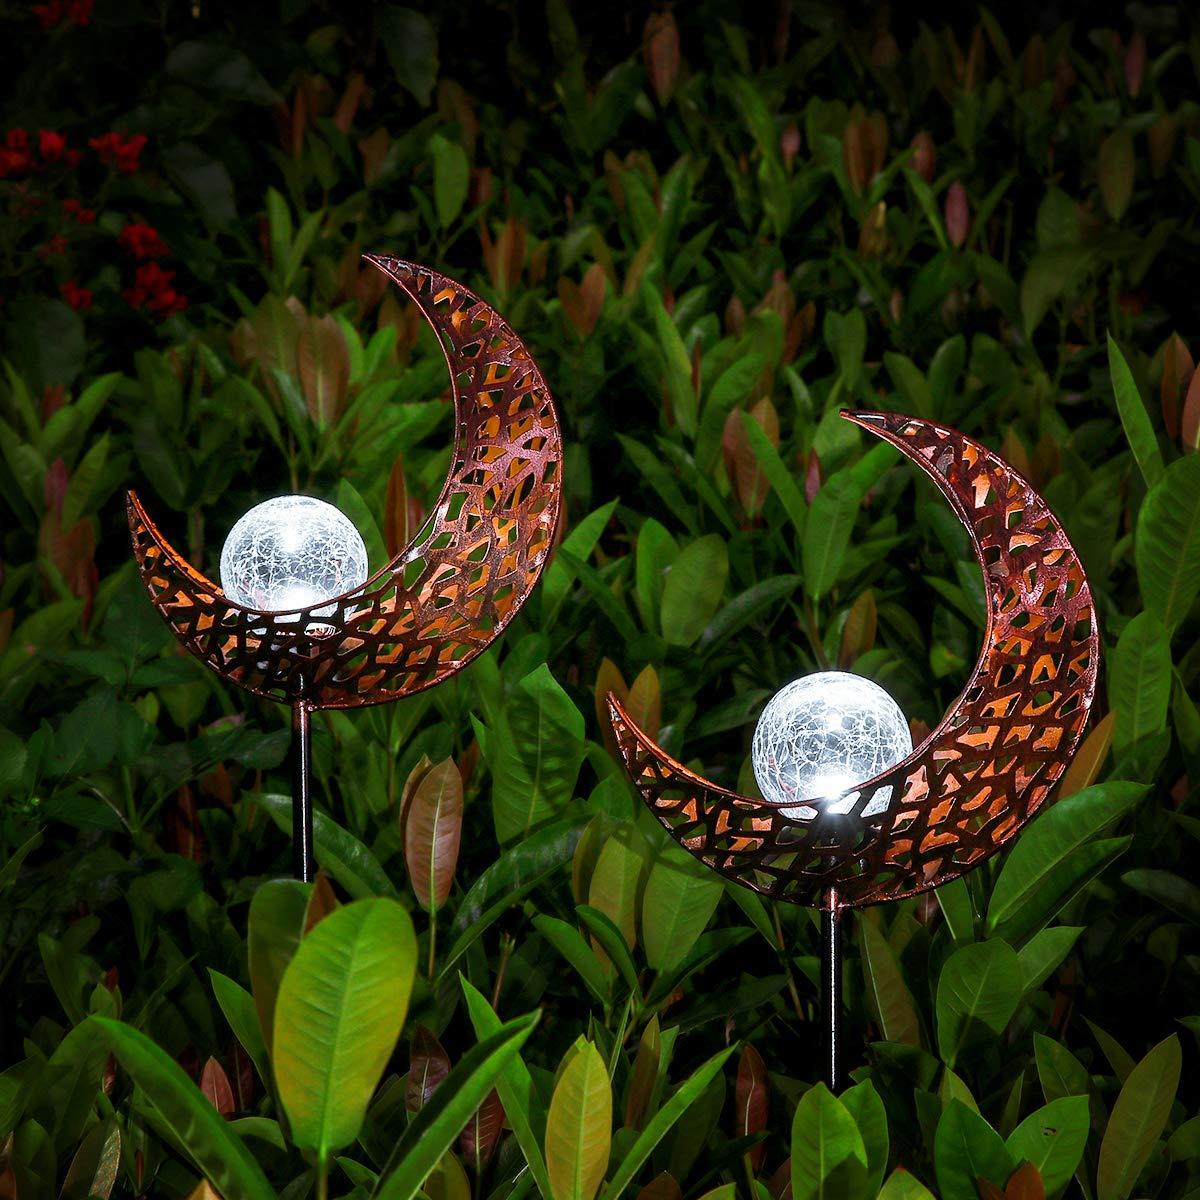 YUNLIGHTS 2pack Garden Solar Lights, Moon Crackle Glass Globe Outdoor Solar Lights, IP64 Waterproof Solar Powered Garden Stake Lights for Garden Patio Backyard Pathway Decoration, White